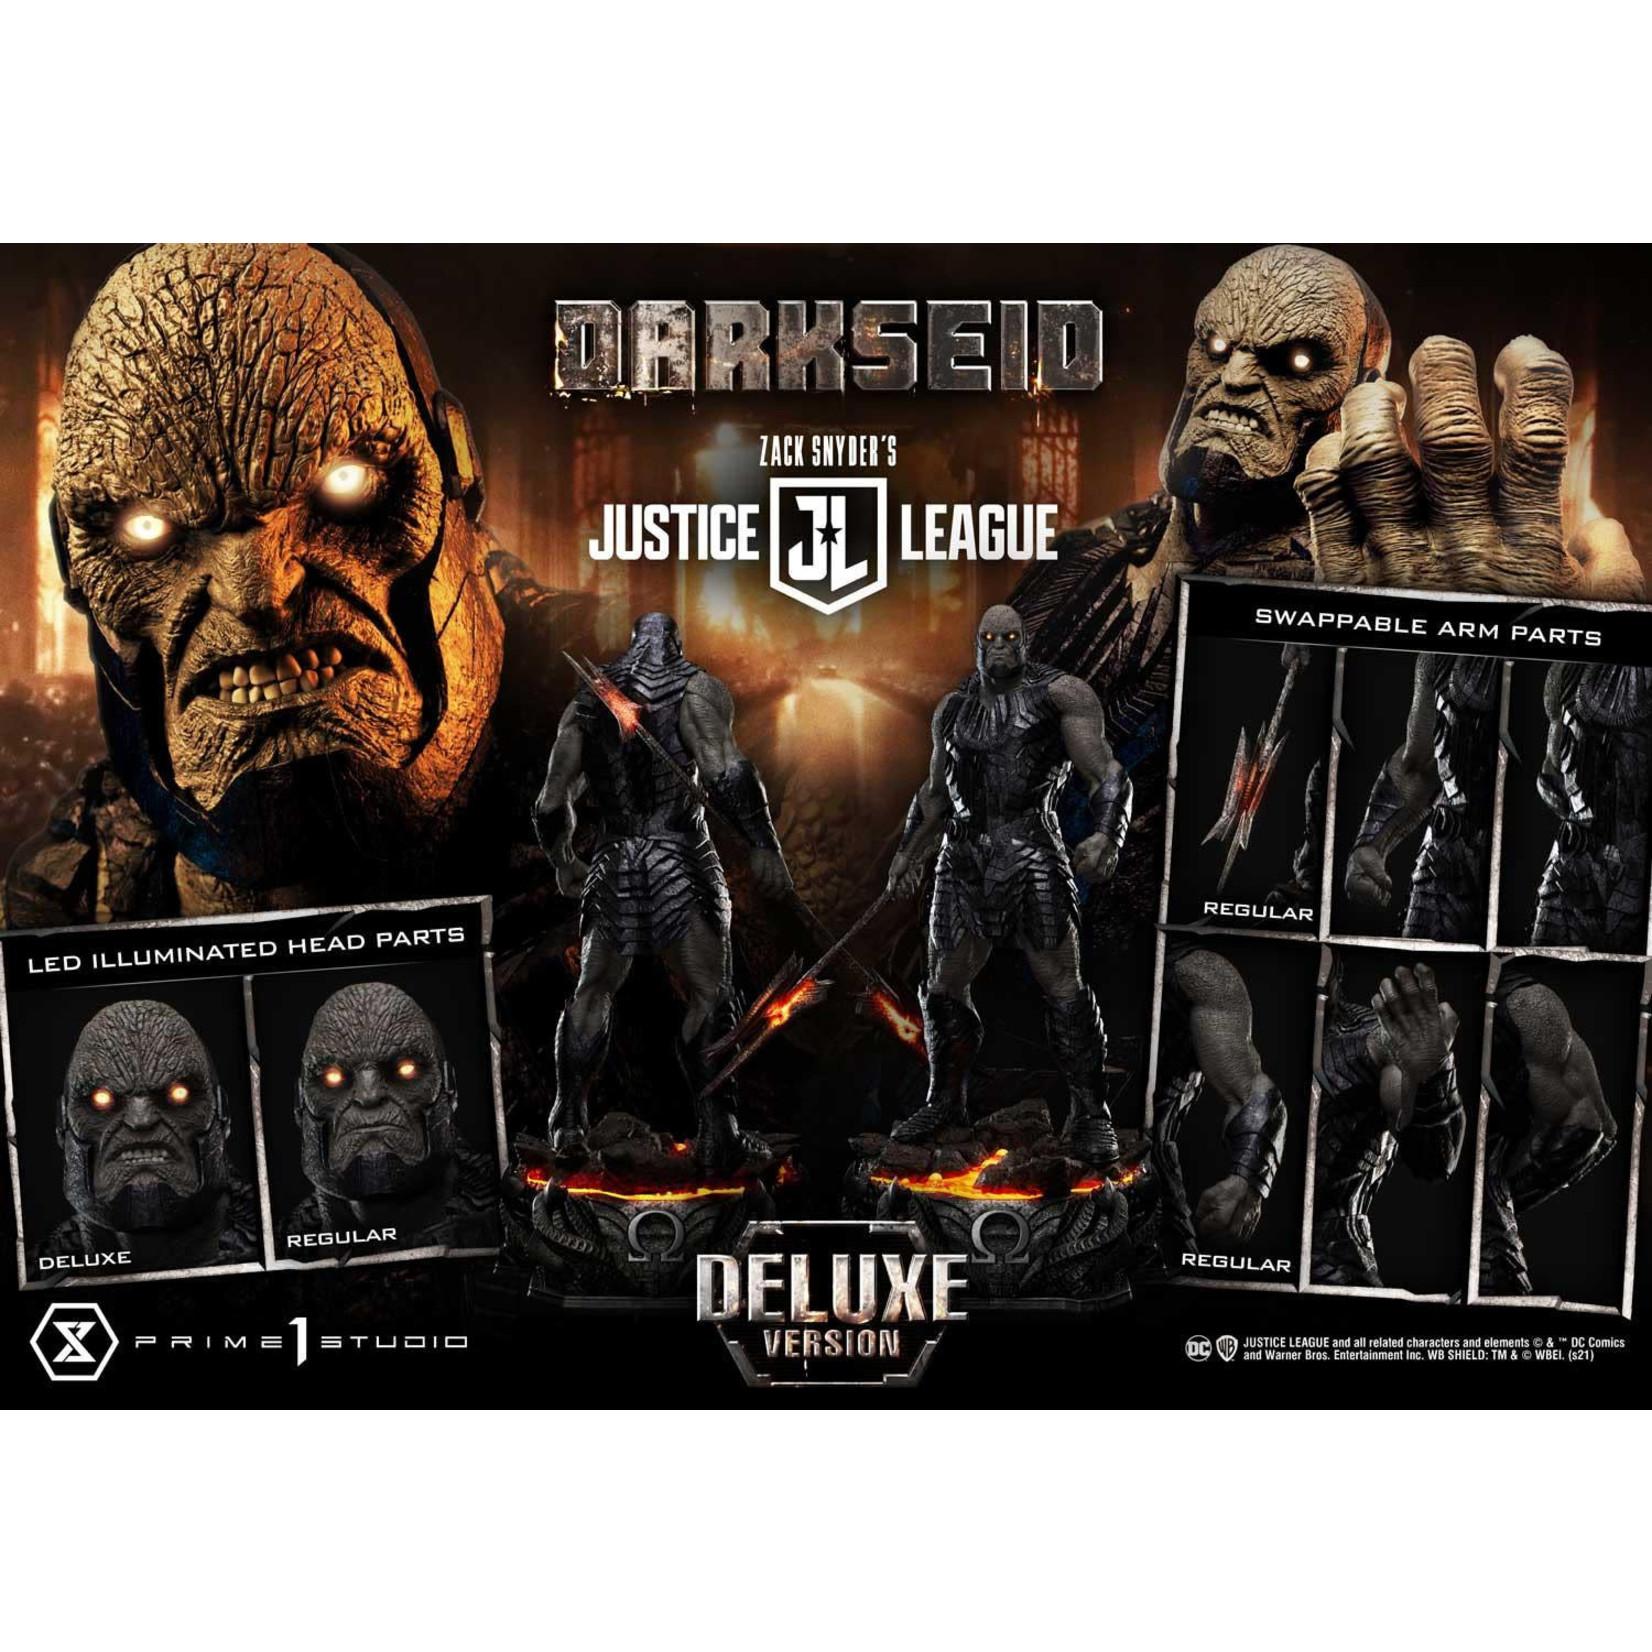 Prime 1 Studio [PREORDER] MMJL-08DX: DARKSEID DELUXE VERSION (ZACK SNYDER'S JUSTICE LEAGUE)